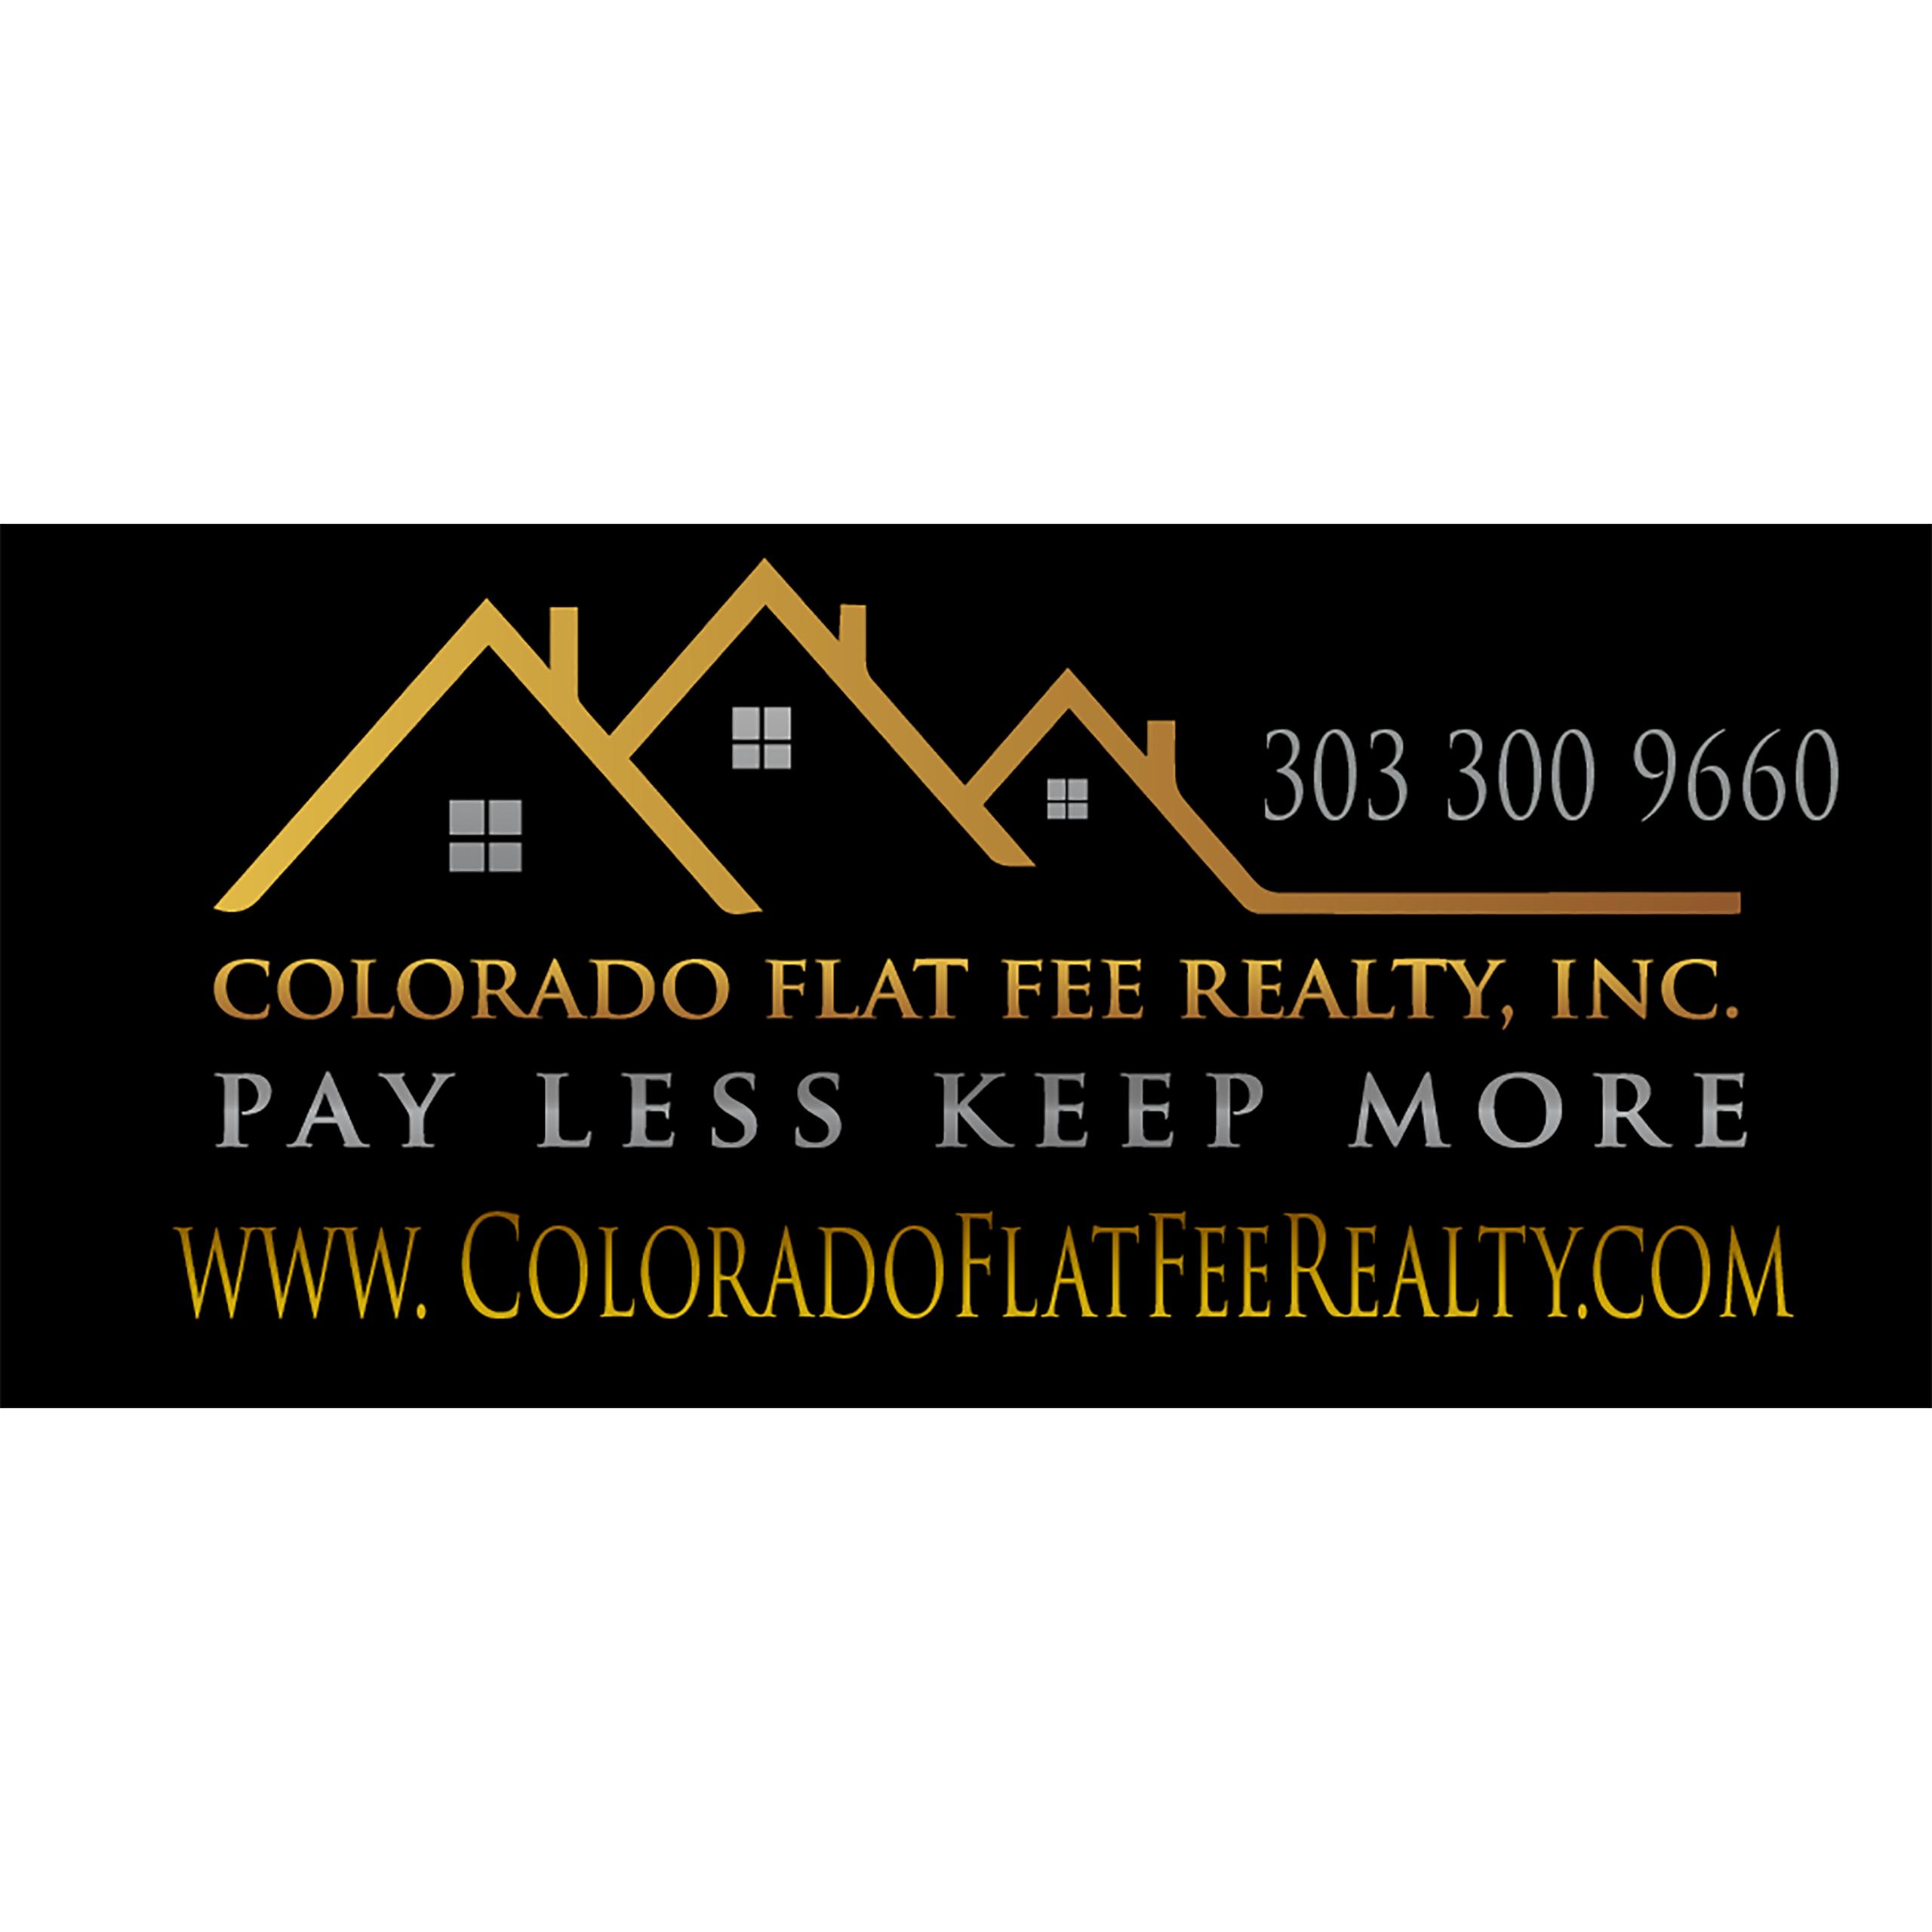 Colorado Flat Fee Realty, Inc.